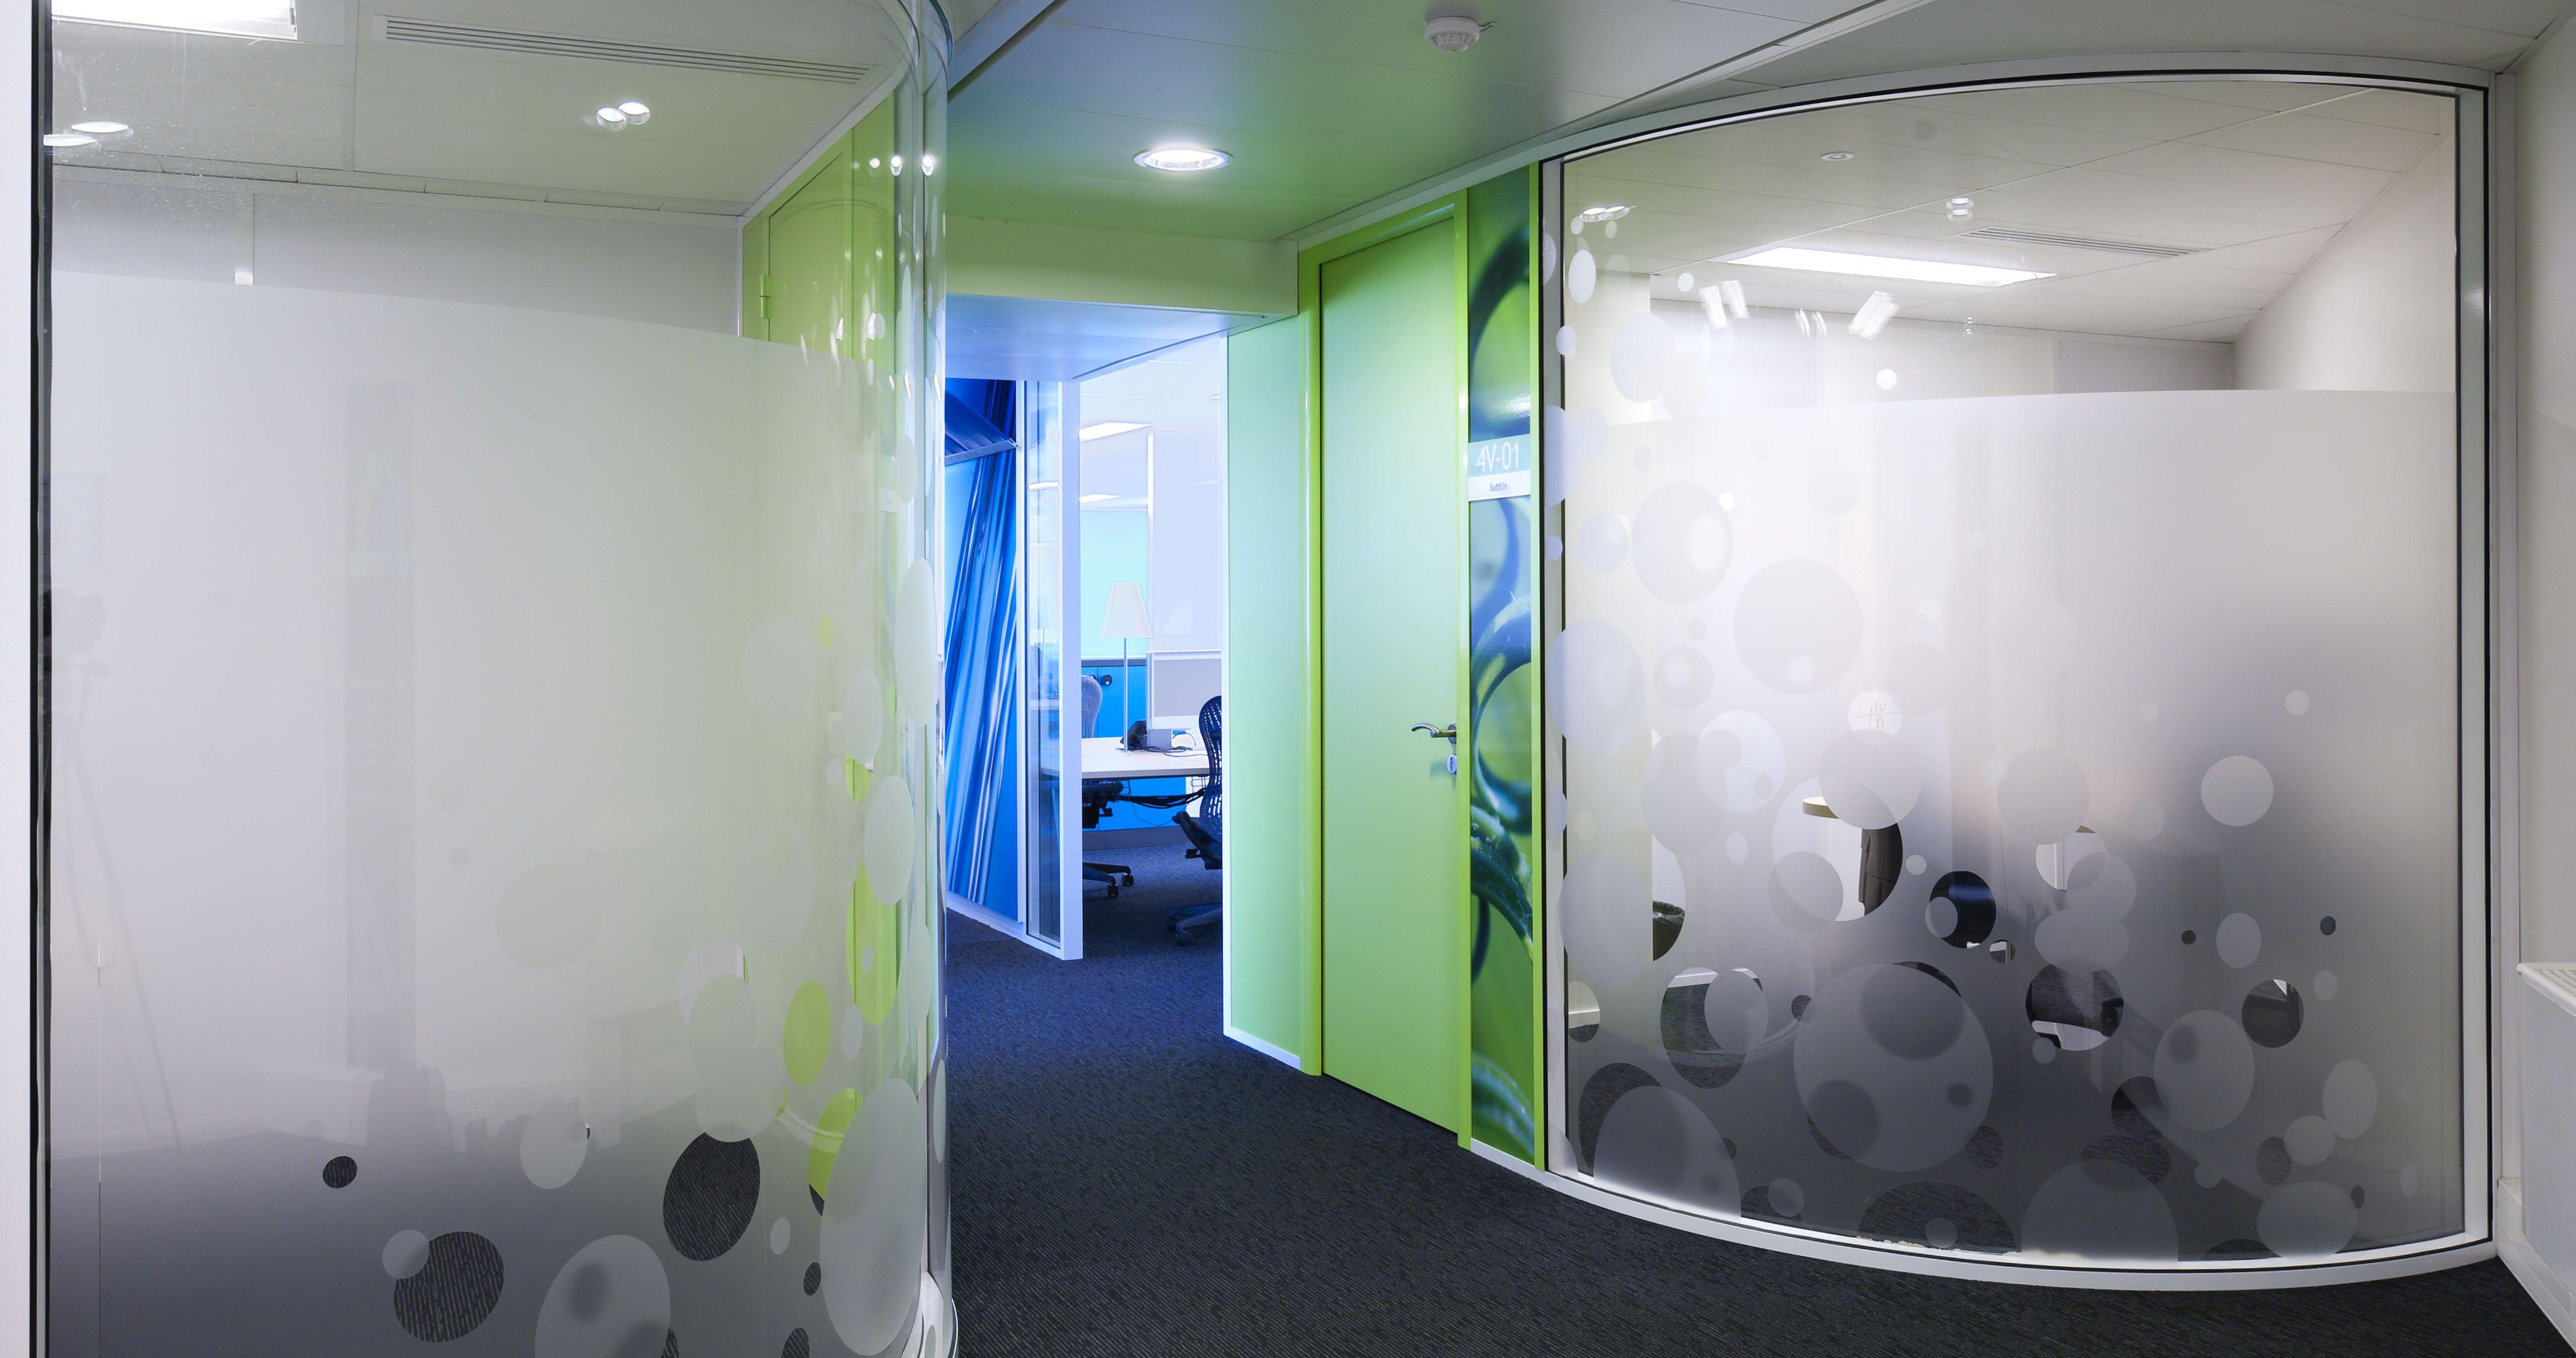 bureau arrondi cloison vitr e courbe pinterest bureau cloison vitre et am nagement bureau. Black Bedroom Furniture Sets. Home Design Ideas